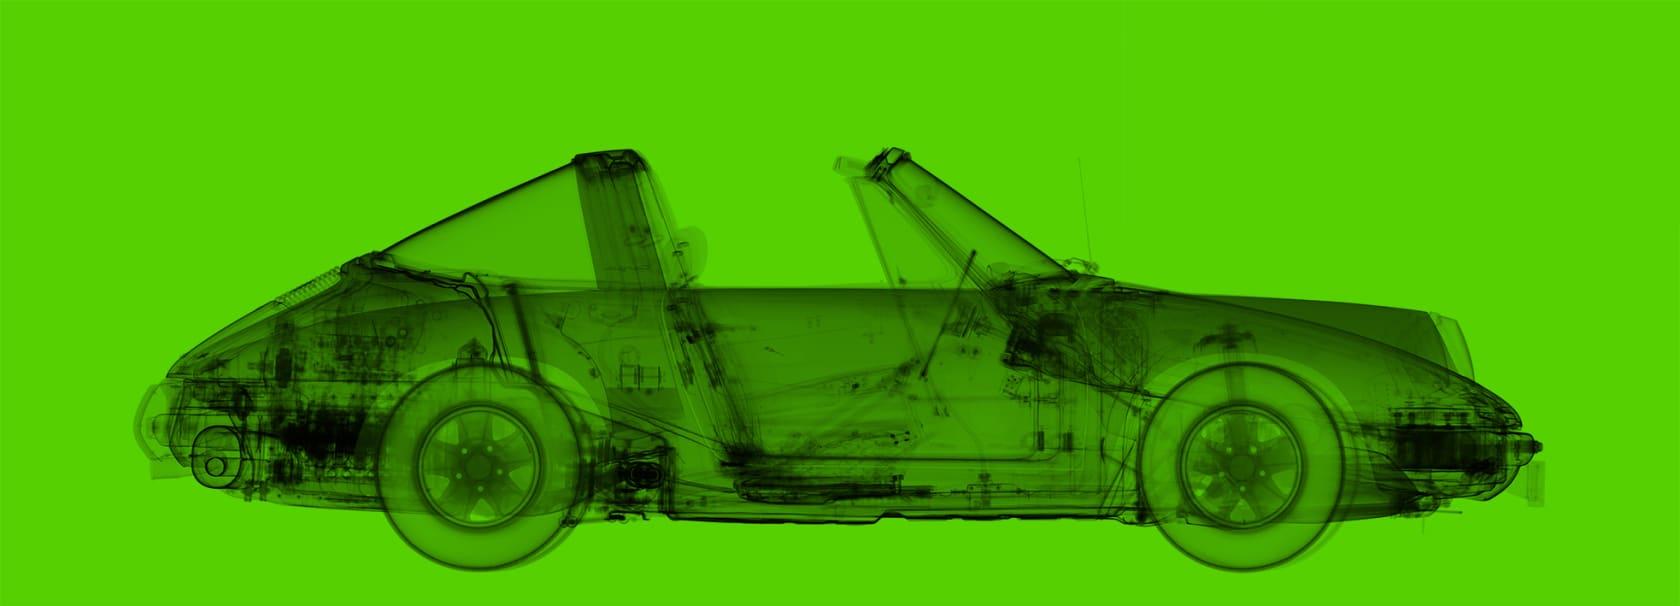 Nick Veasey 1972 Porsche 911 Targa Light Green Diasec C-Type Print onto Dibond with Matte Plexi Face